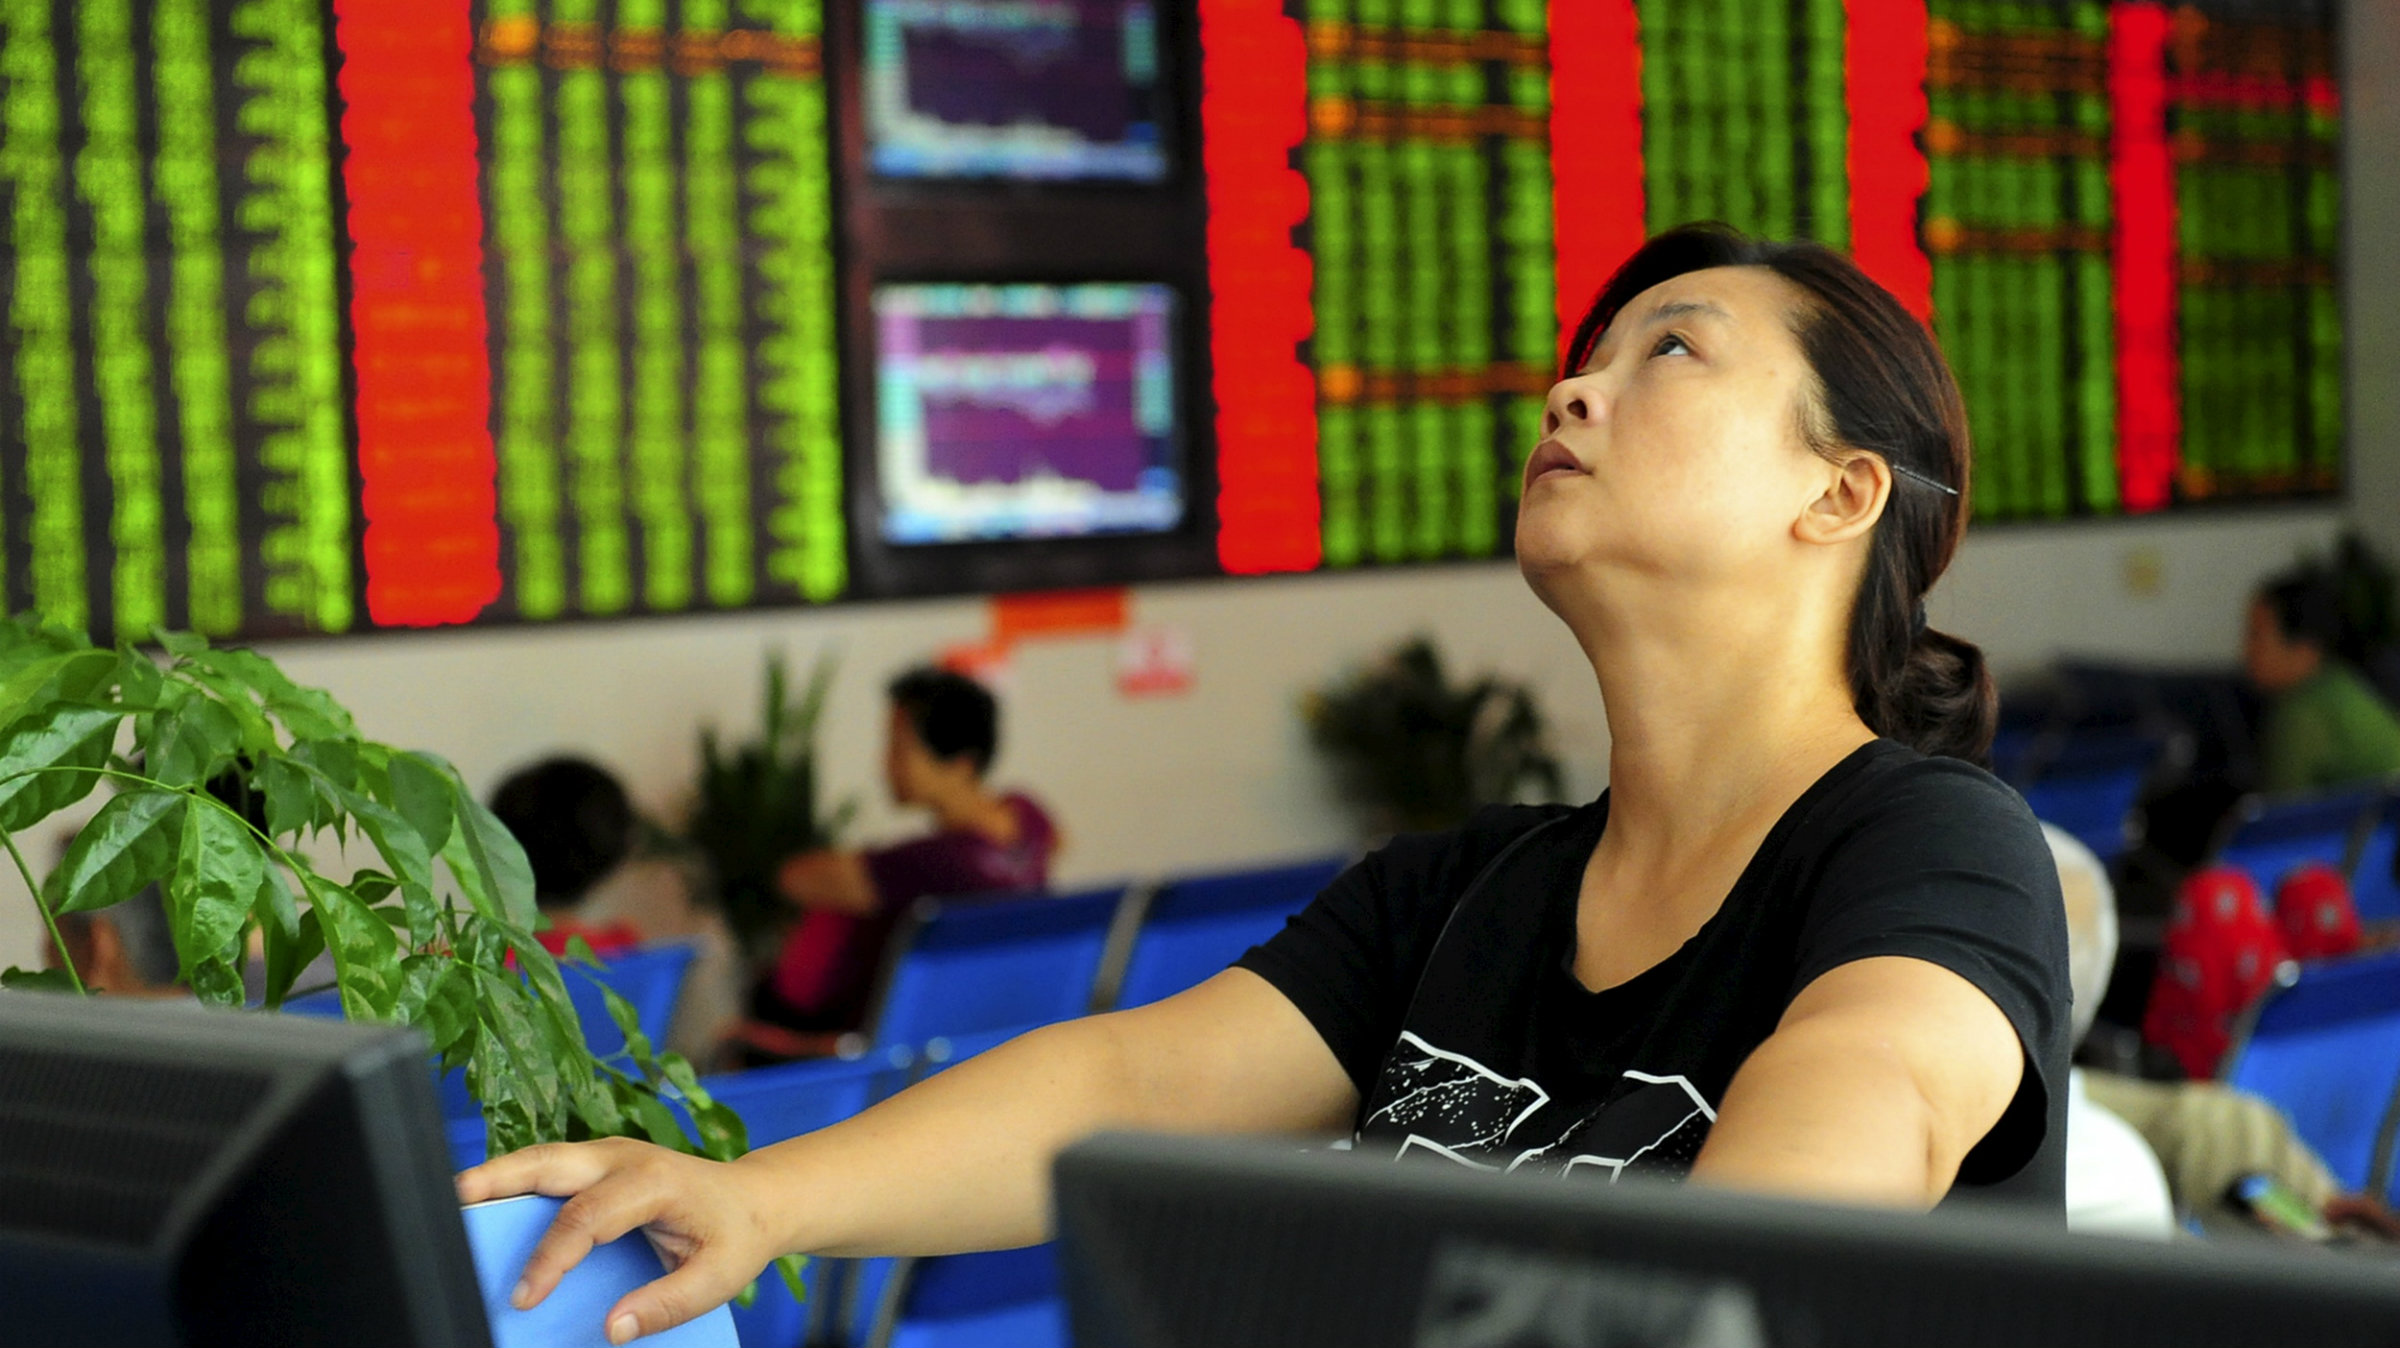 China markets aug 21